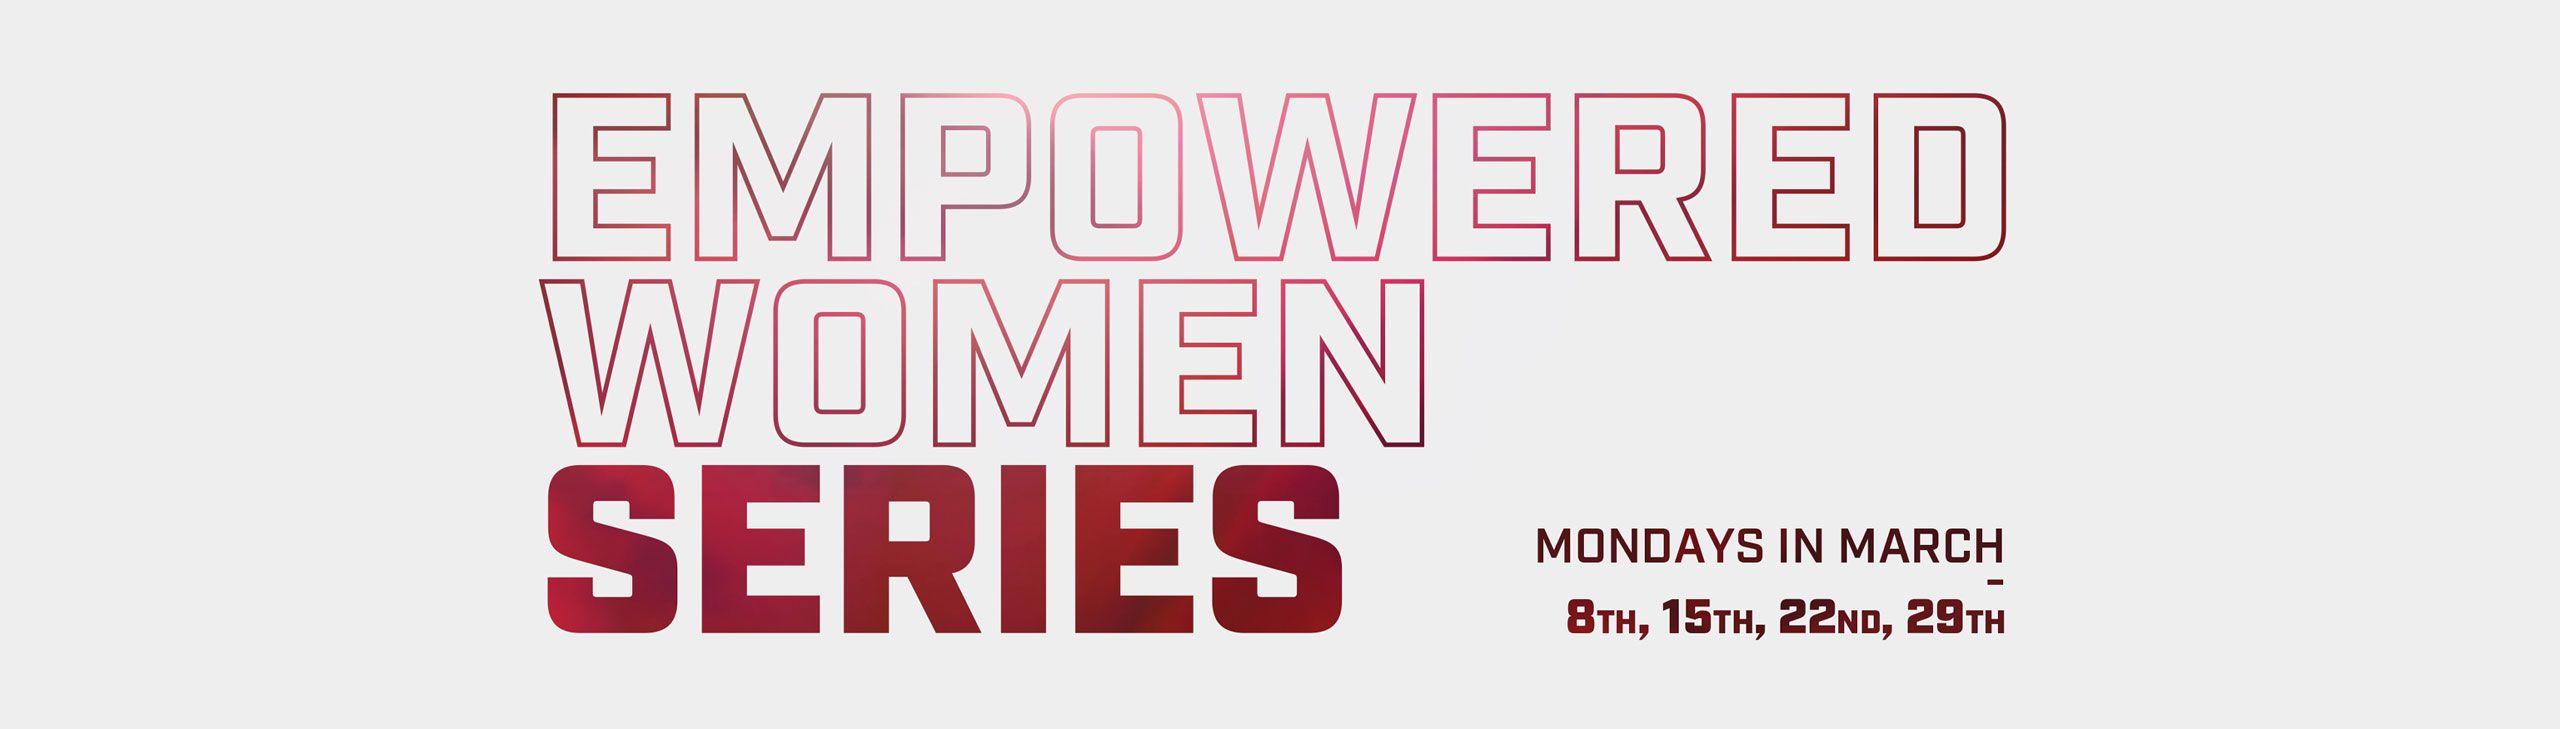 WomensHistoryMonth_WHMHub_EmpoweredWomenSeries_2560x700